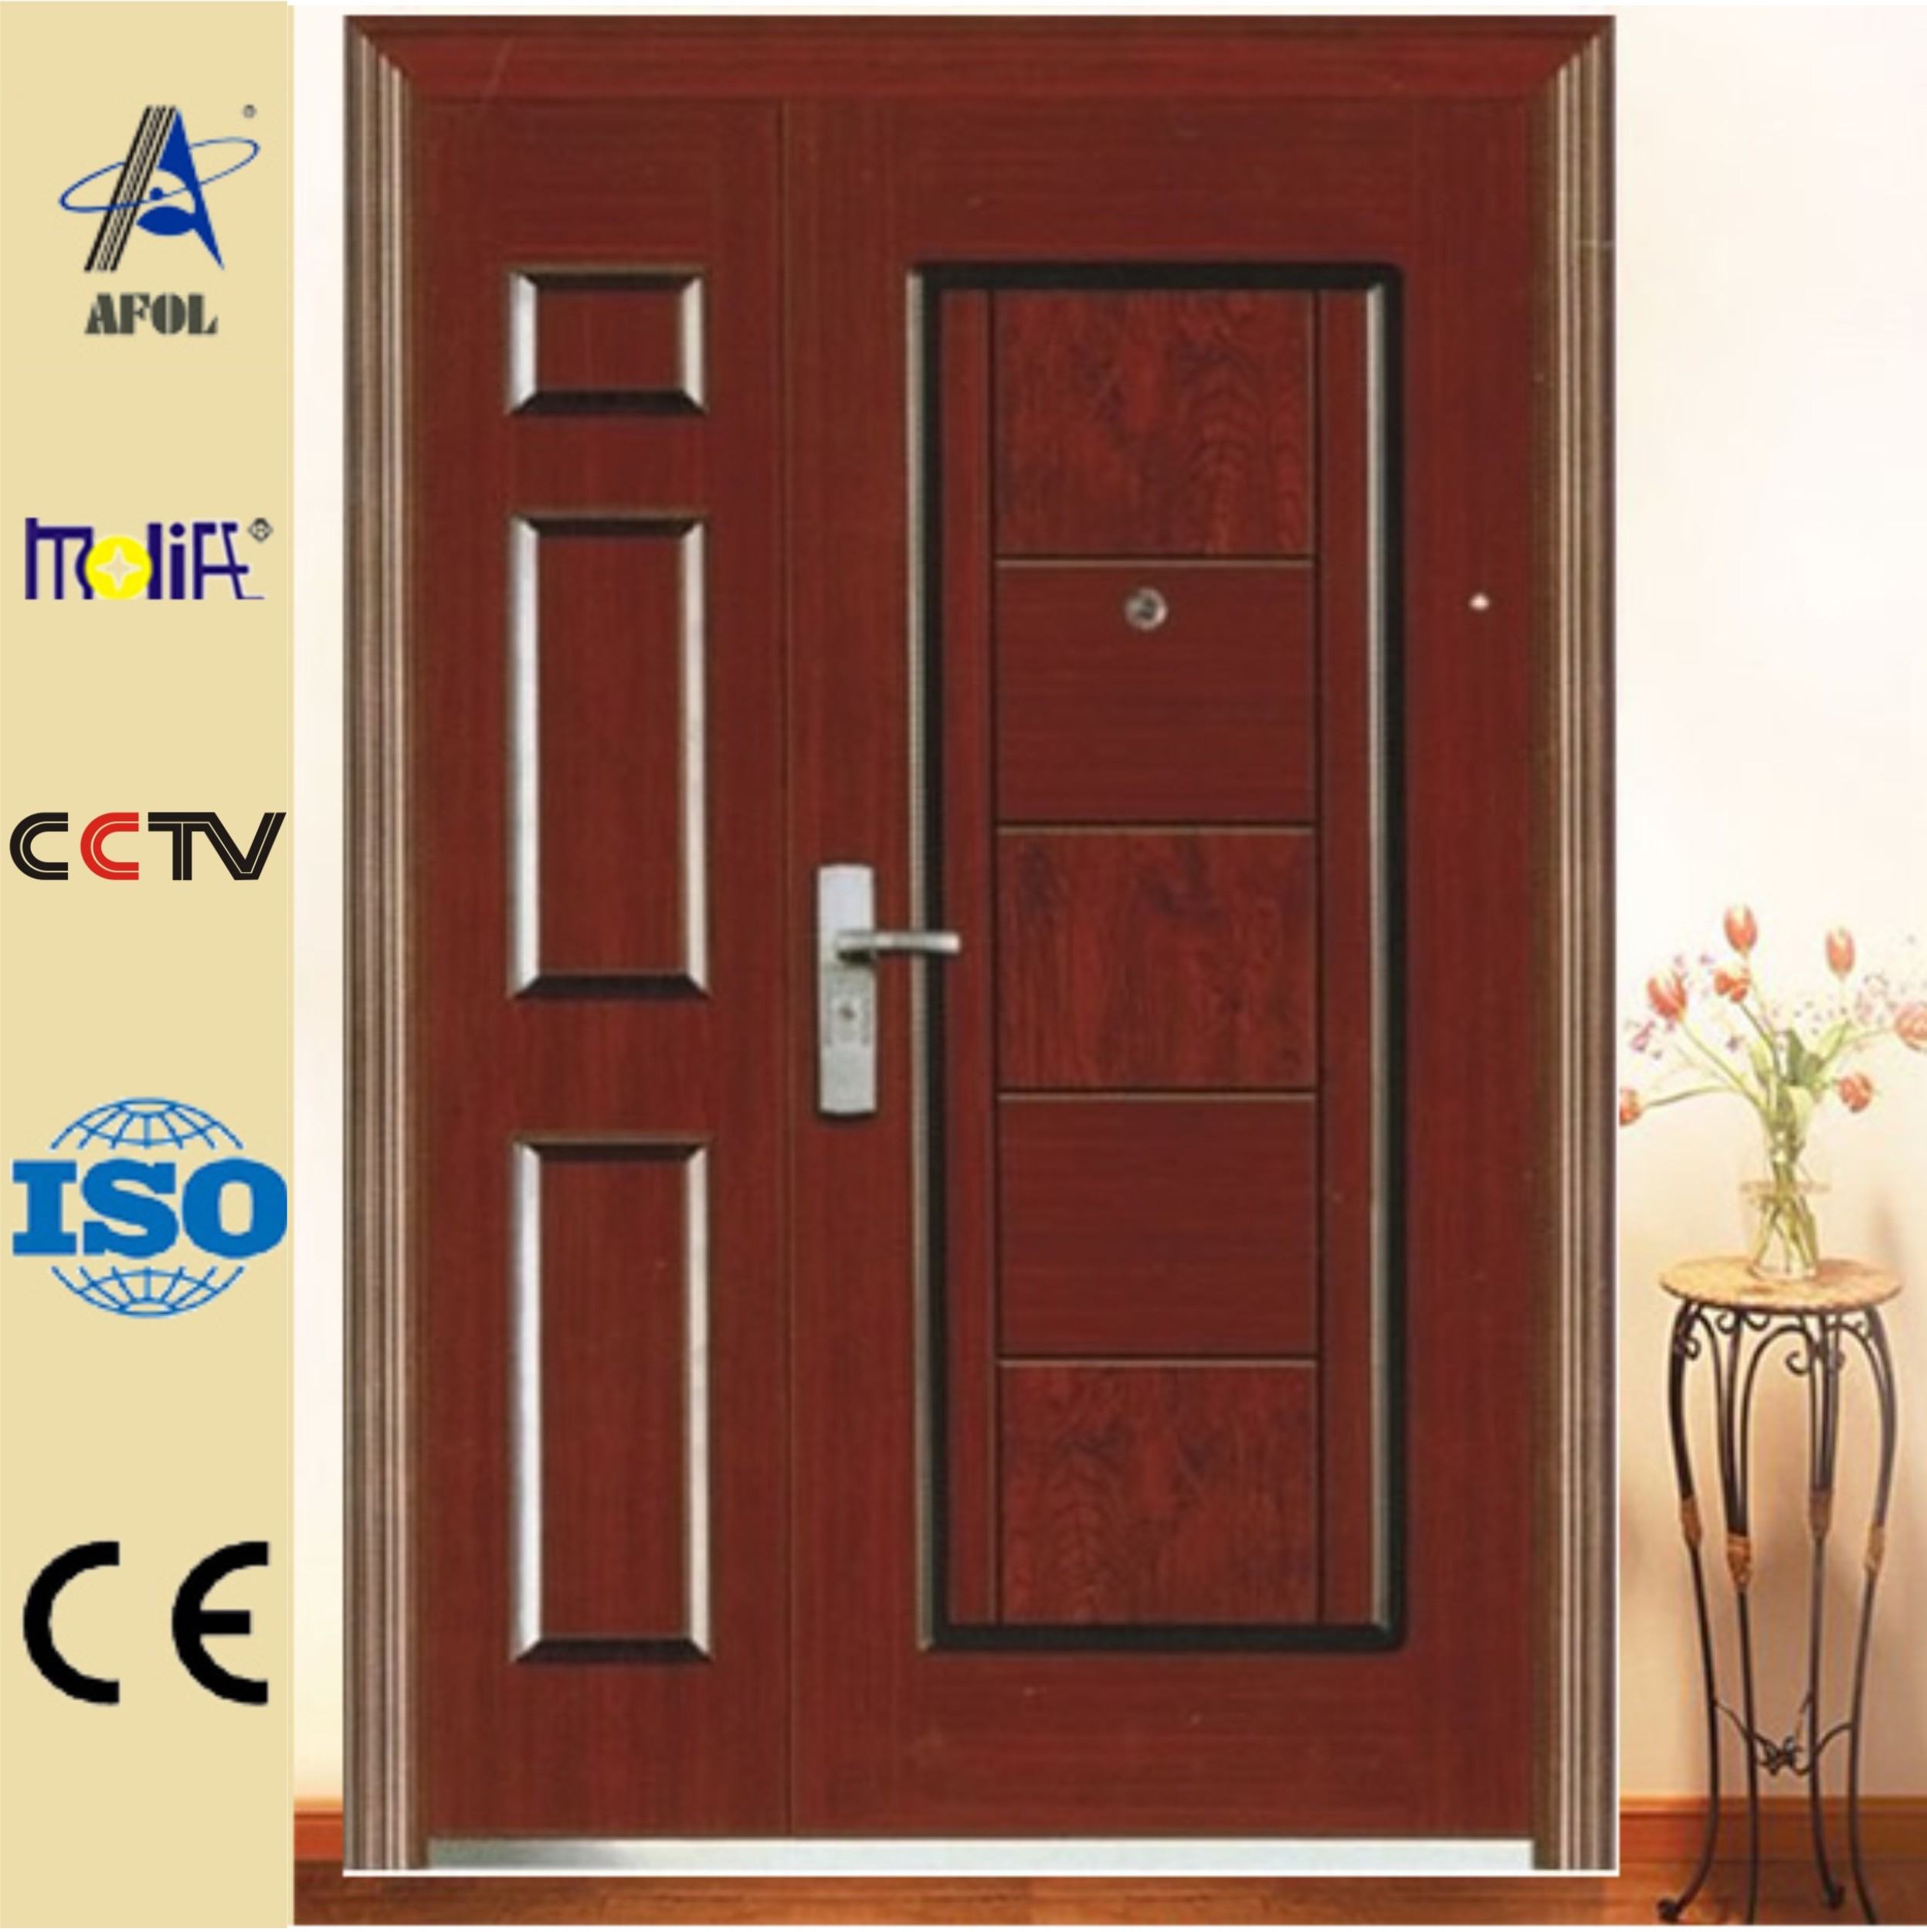 afol chinese supplier of doors design